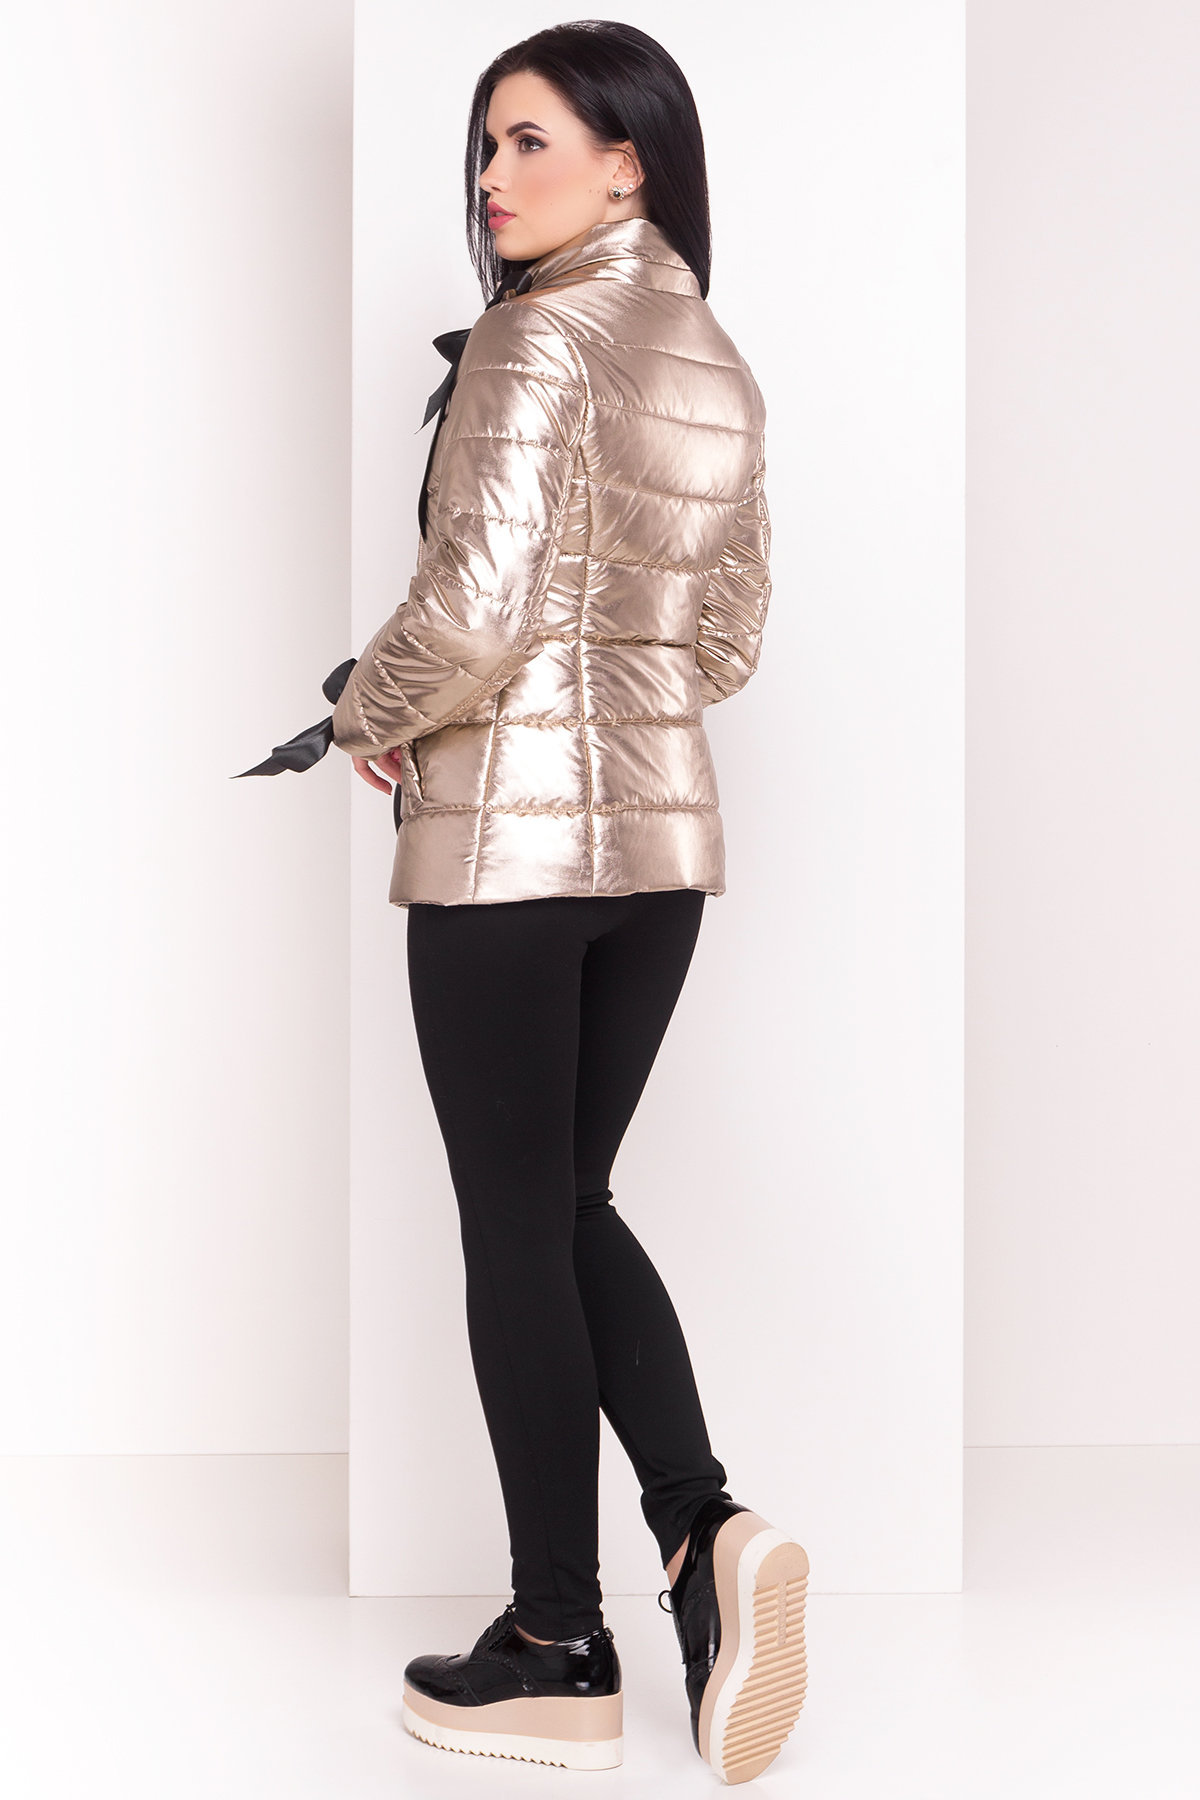 Куртка металлик Эллария 4589 АРТ. 21749 Цвет: Золото - фото 2, интернет магазин tm-modus.ru